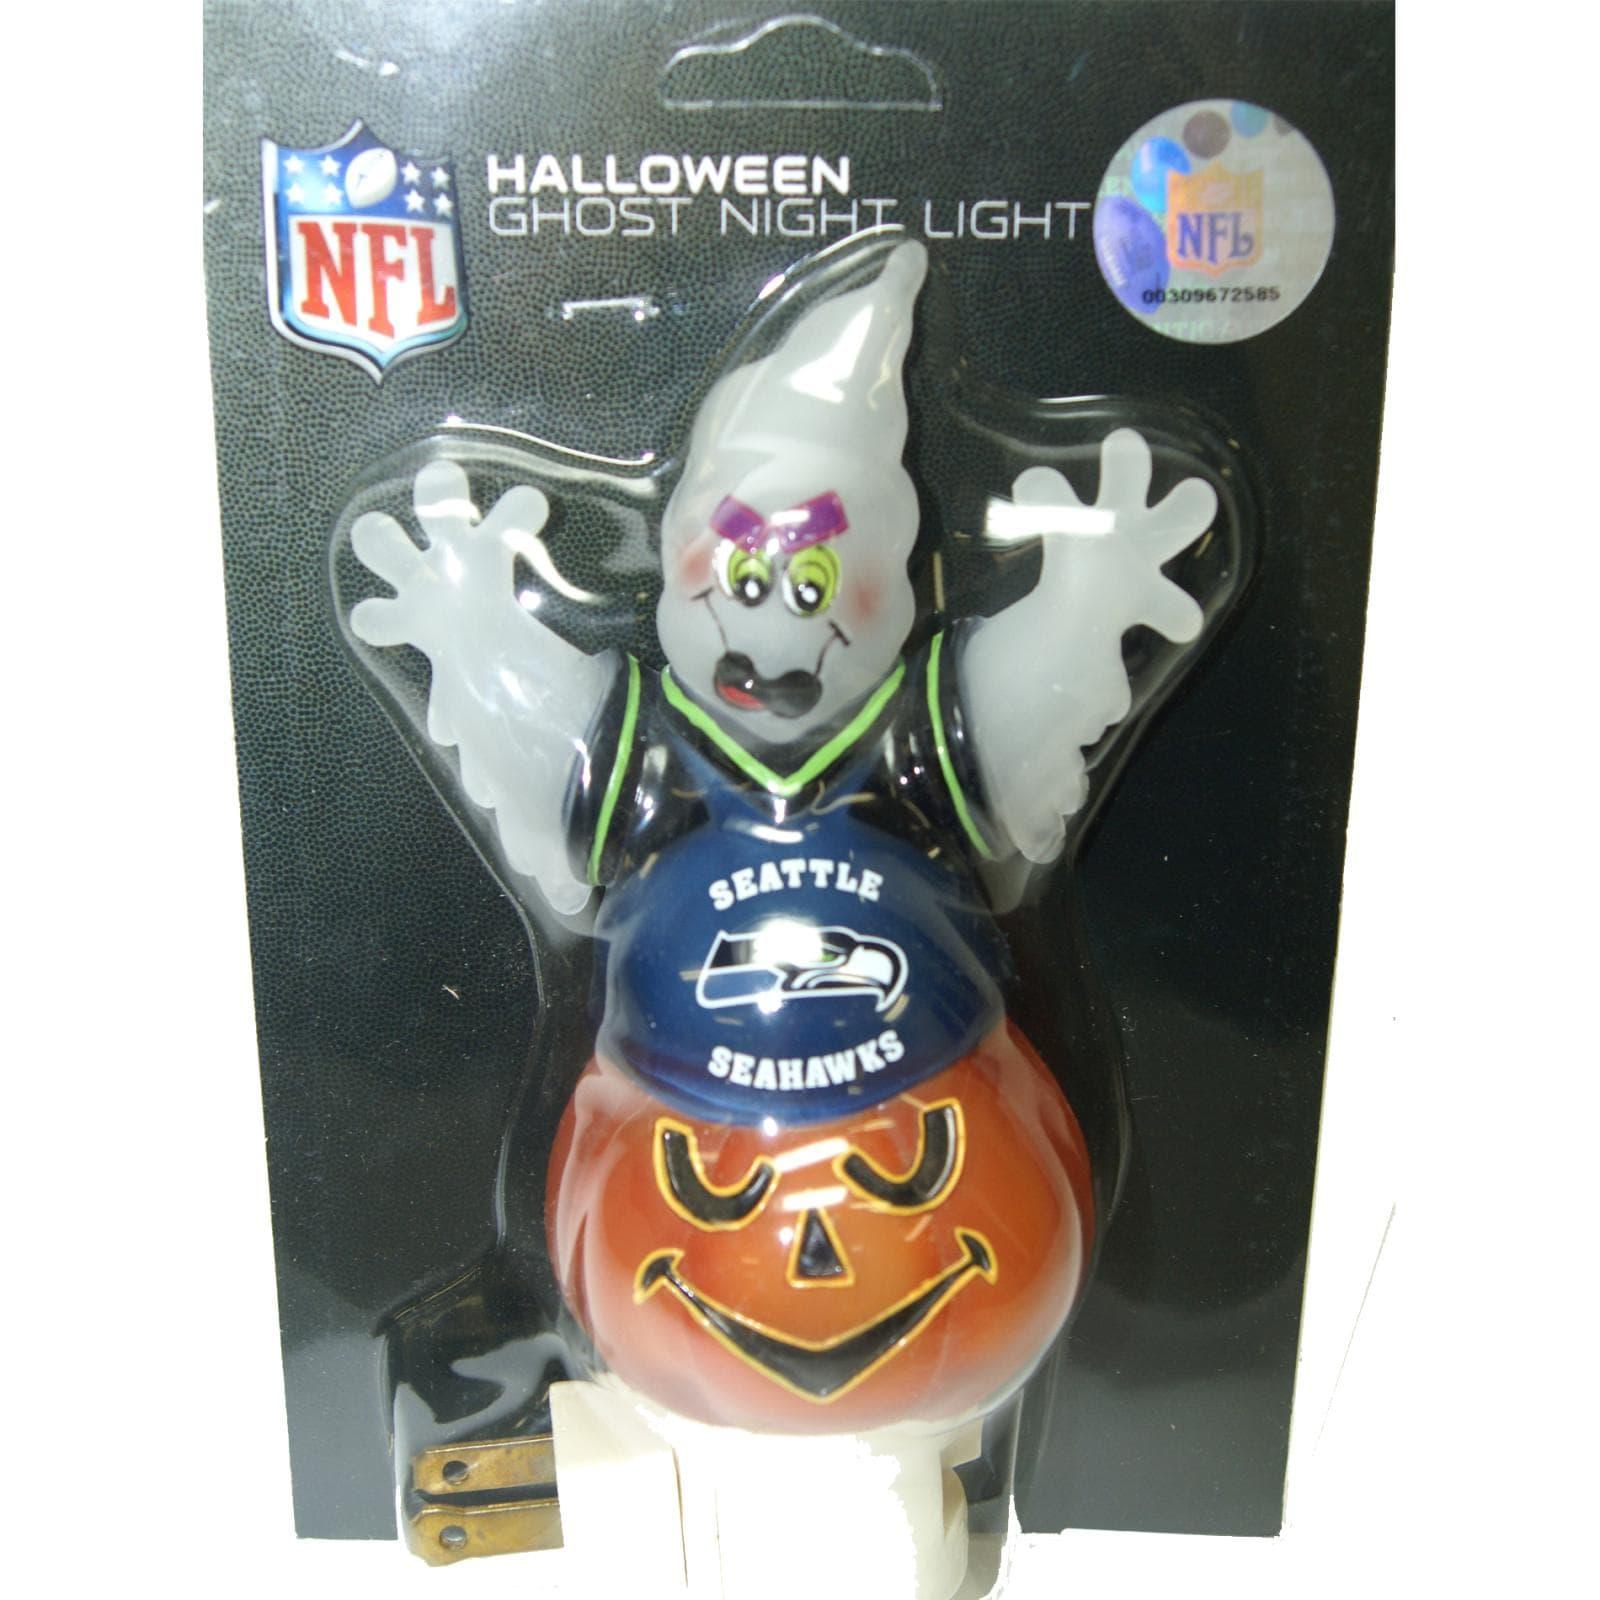 Seattle Seahawks Halloween Ghost Night Light